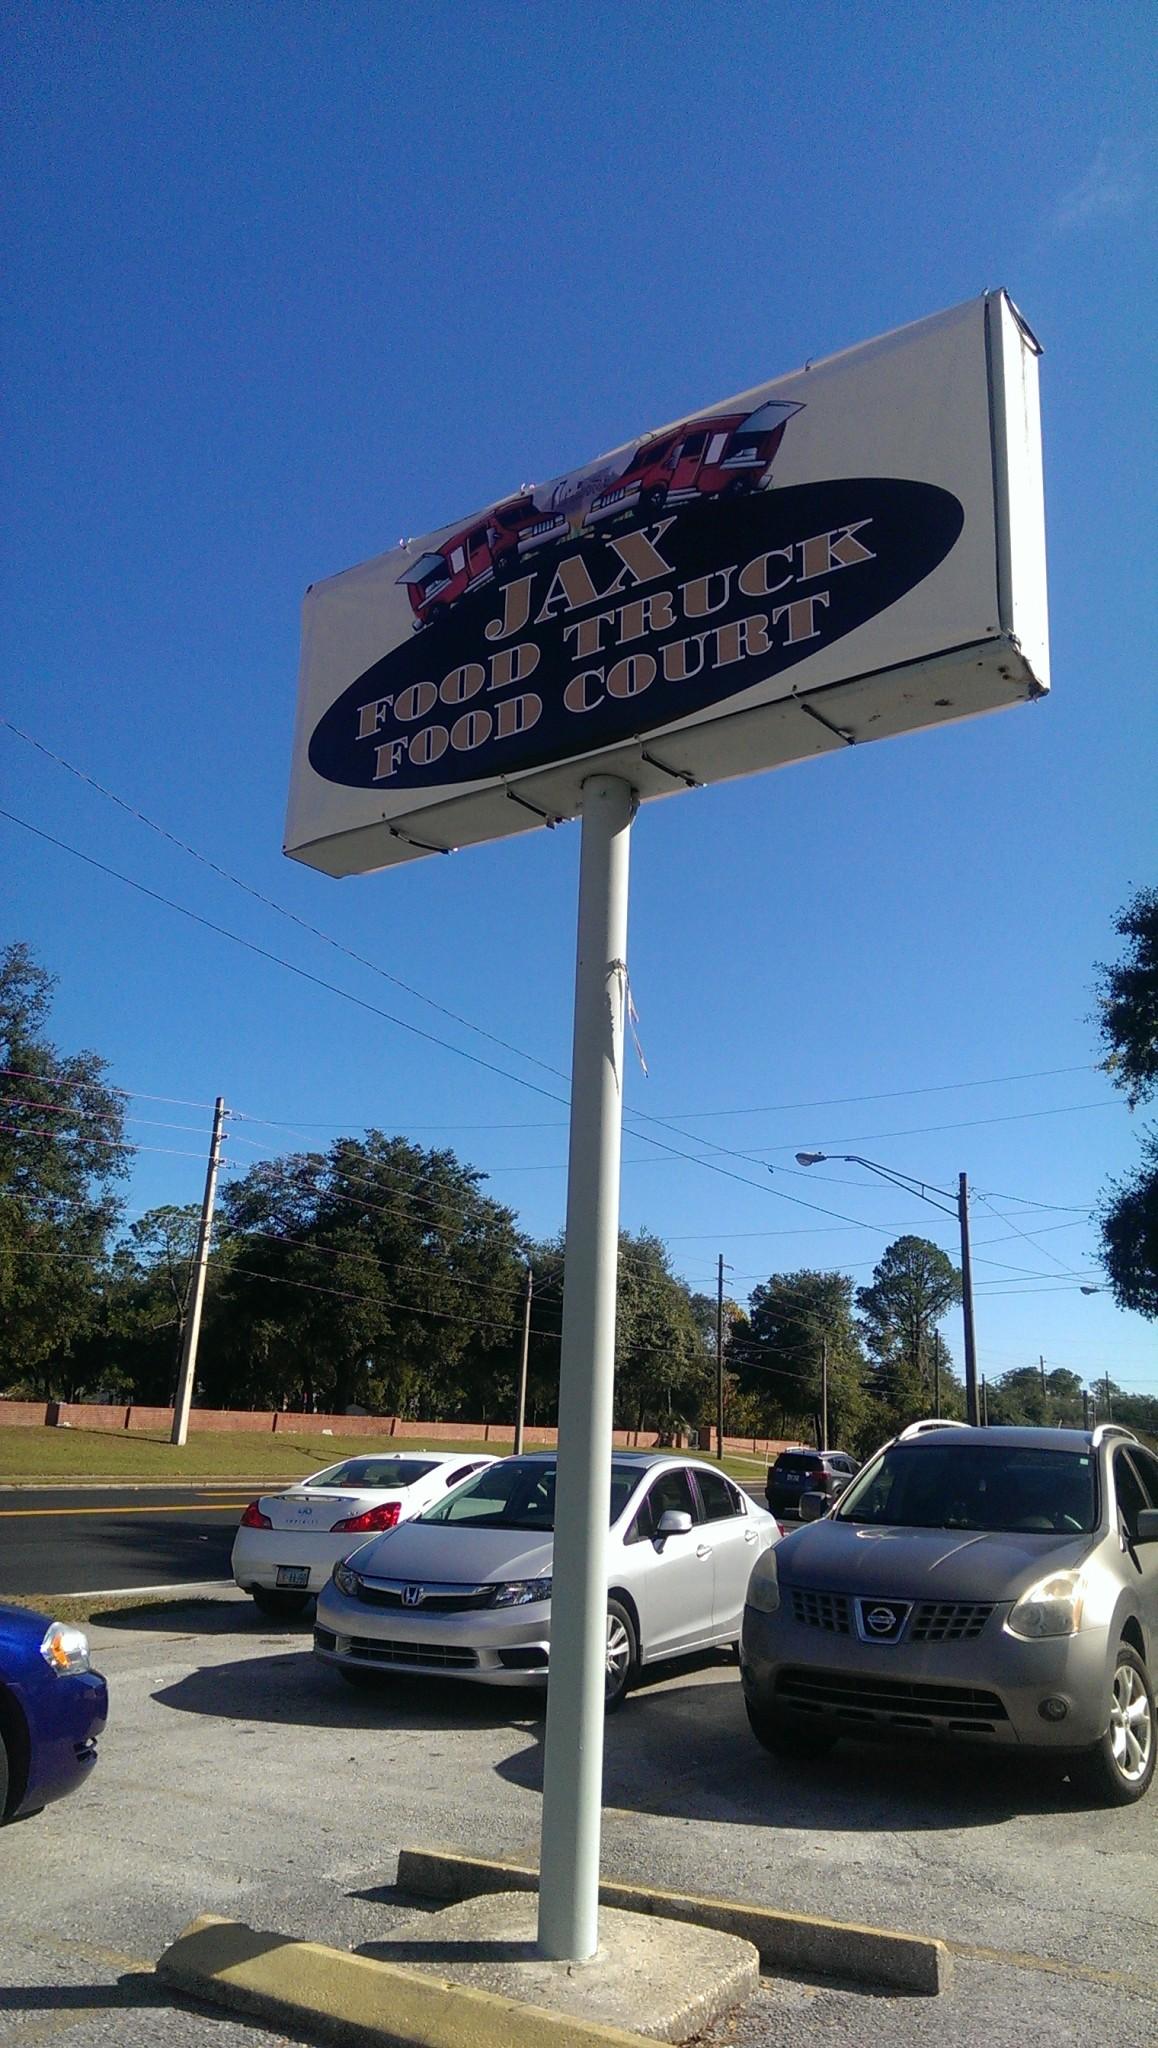 Jax Food Truck Food Court - Jacksonville Restaurant Reviews